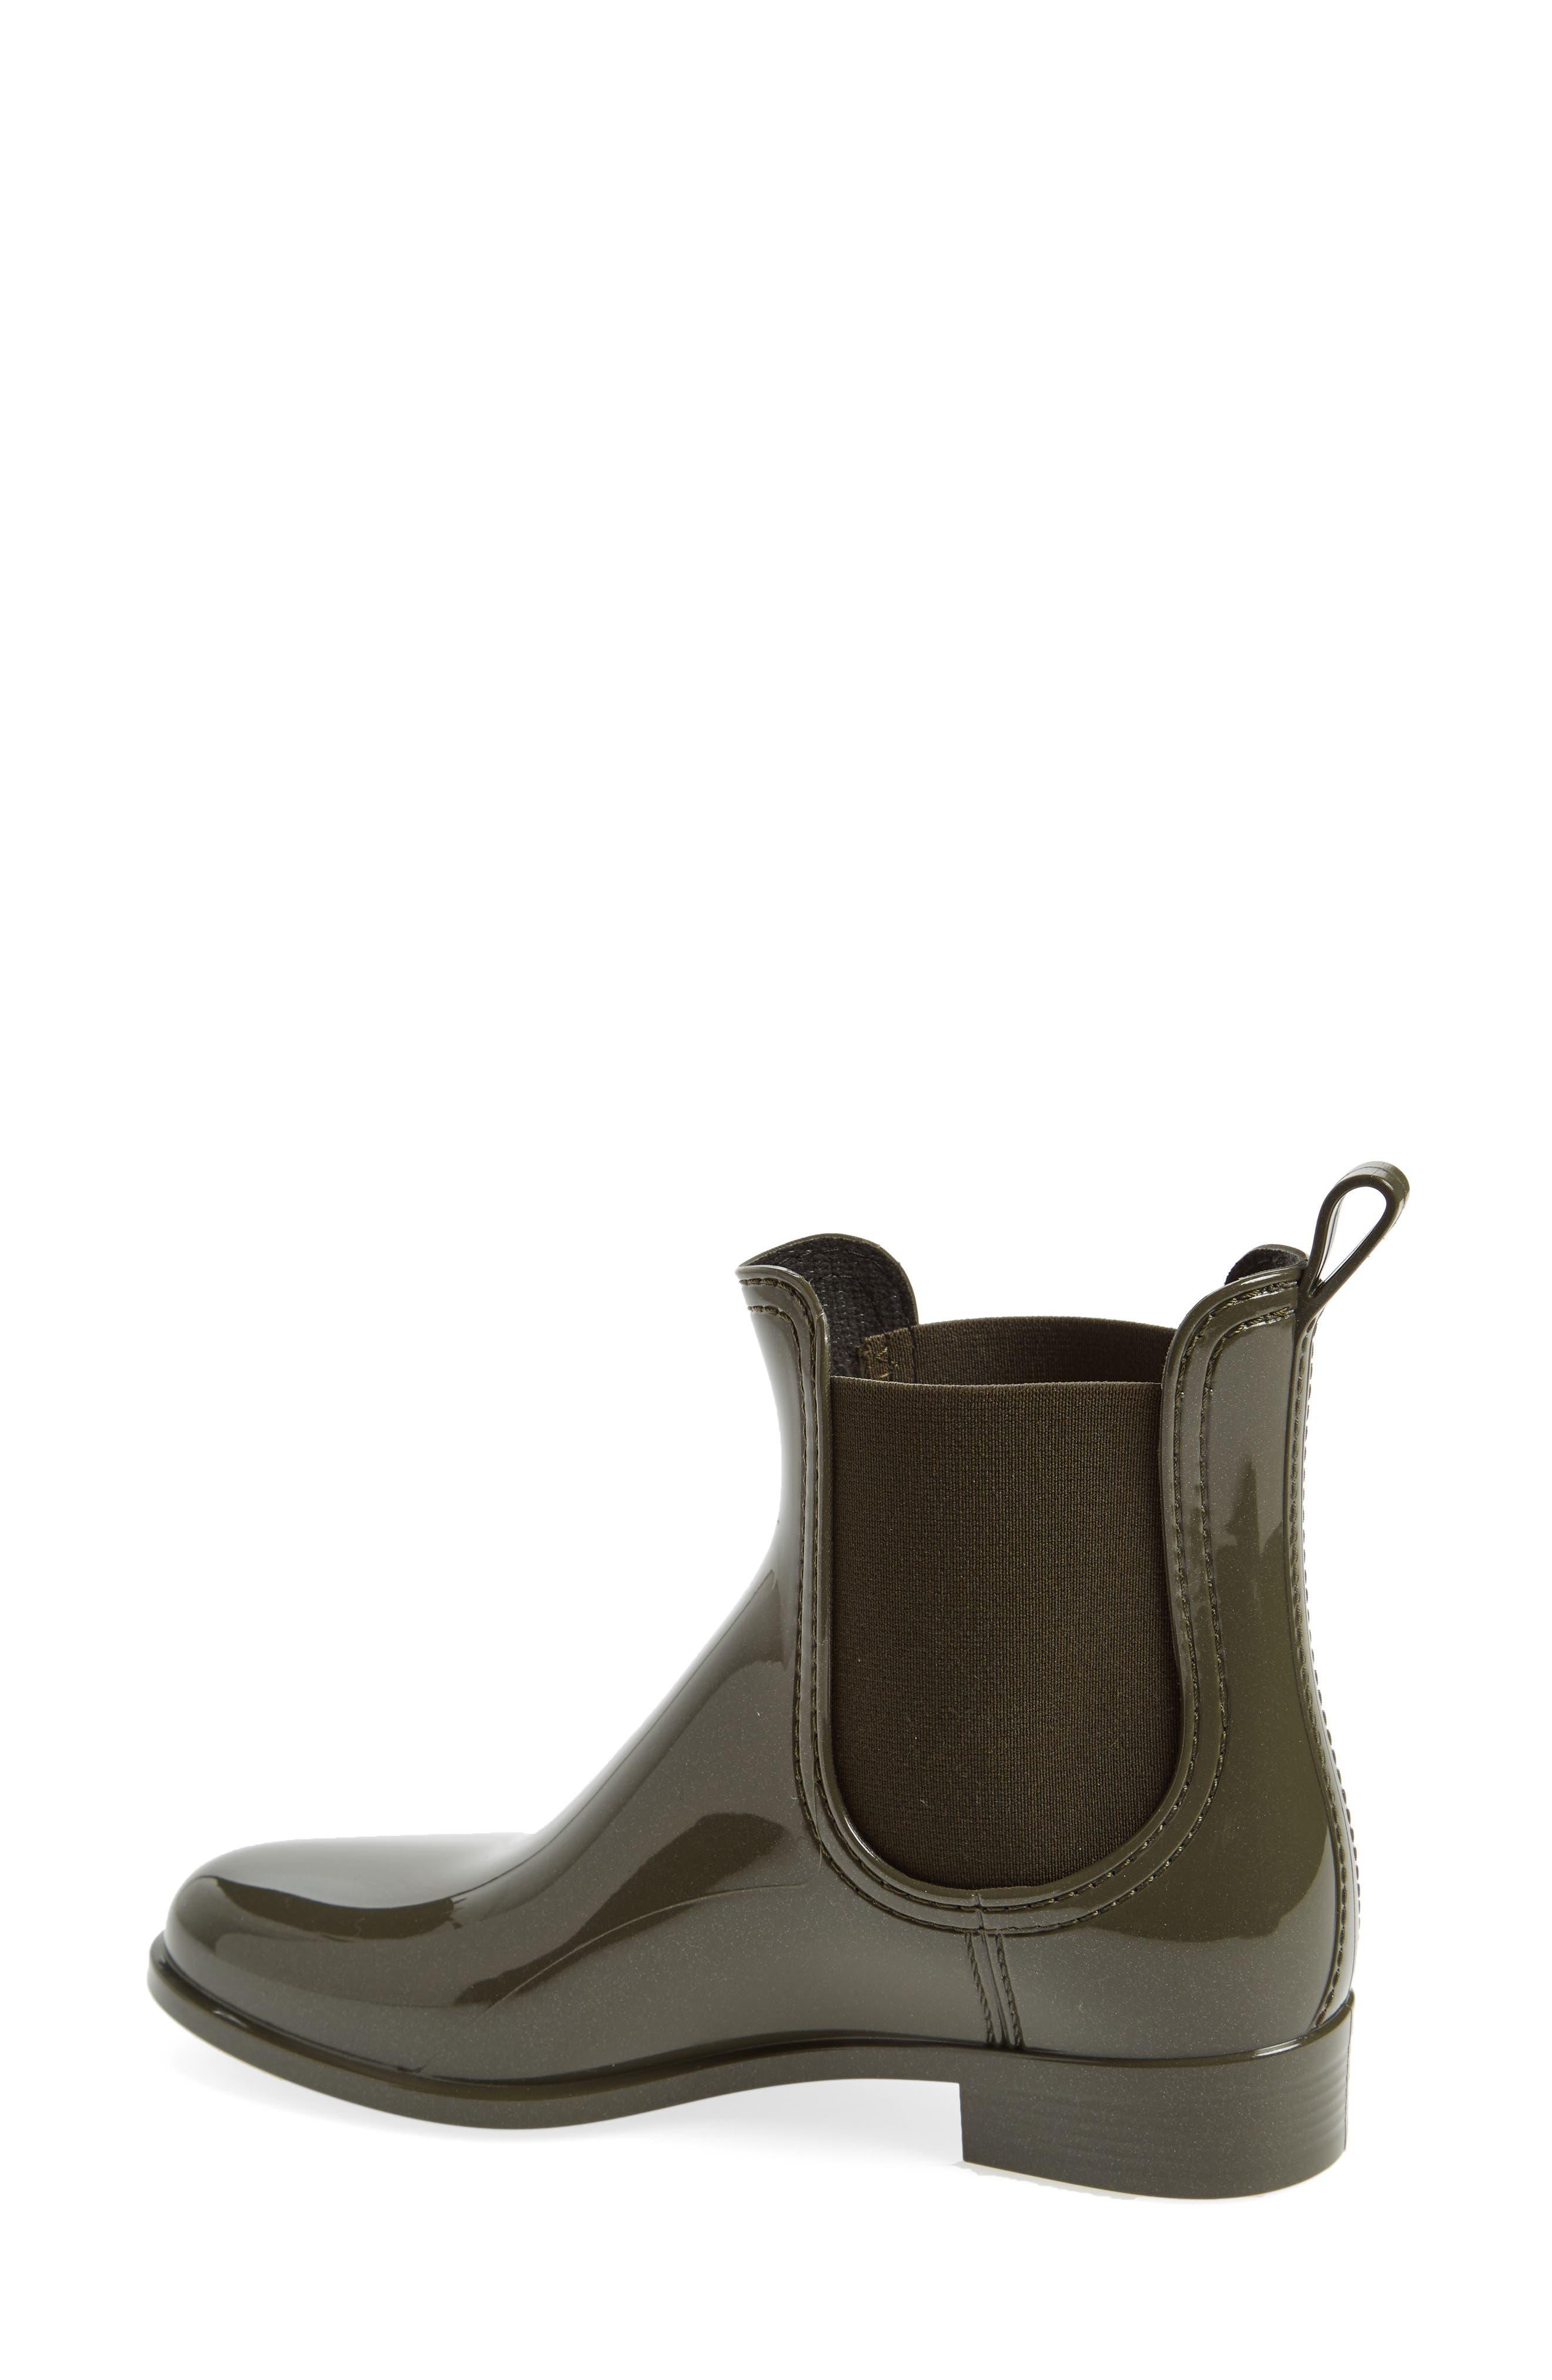 Comfy Waterproof Chelsea Boot,                             Alternate thumbnail 2, color,                             Metal Green Gloss